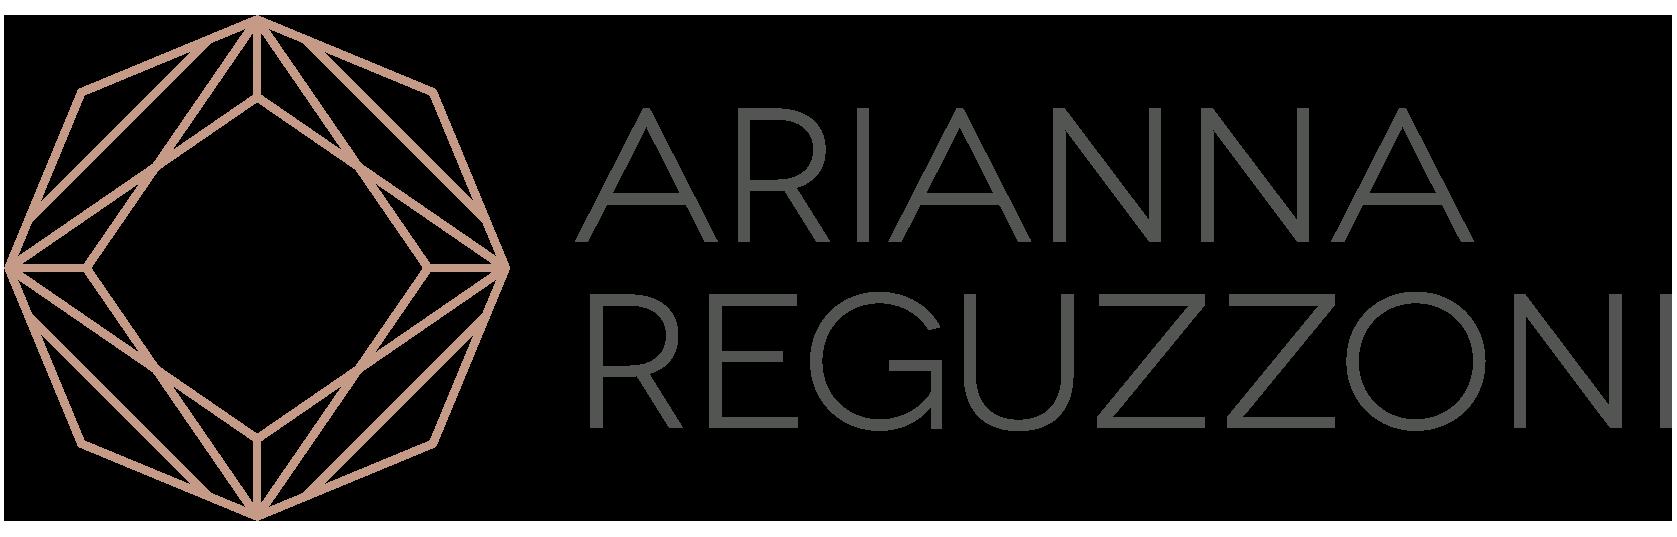 Arianna Reguzzoni